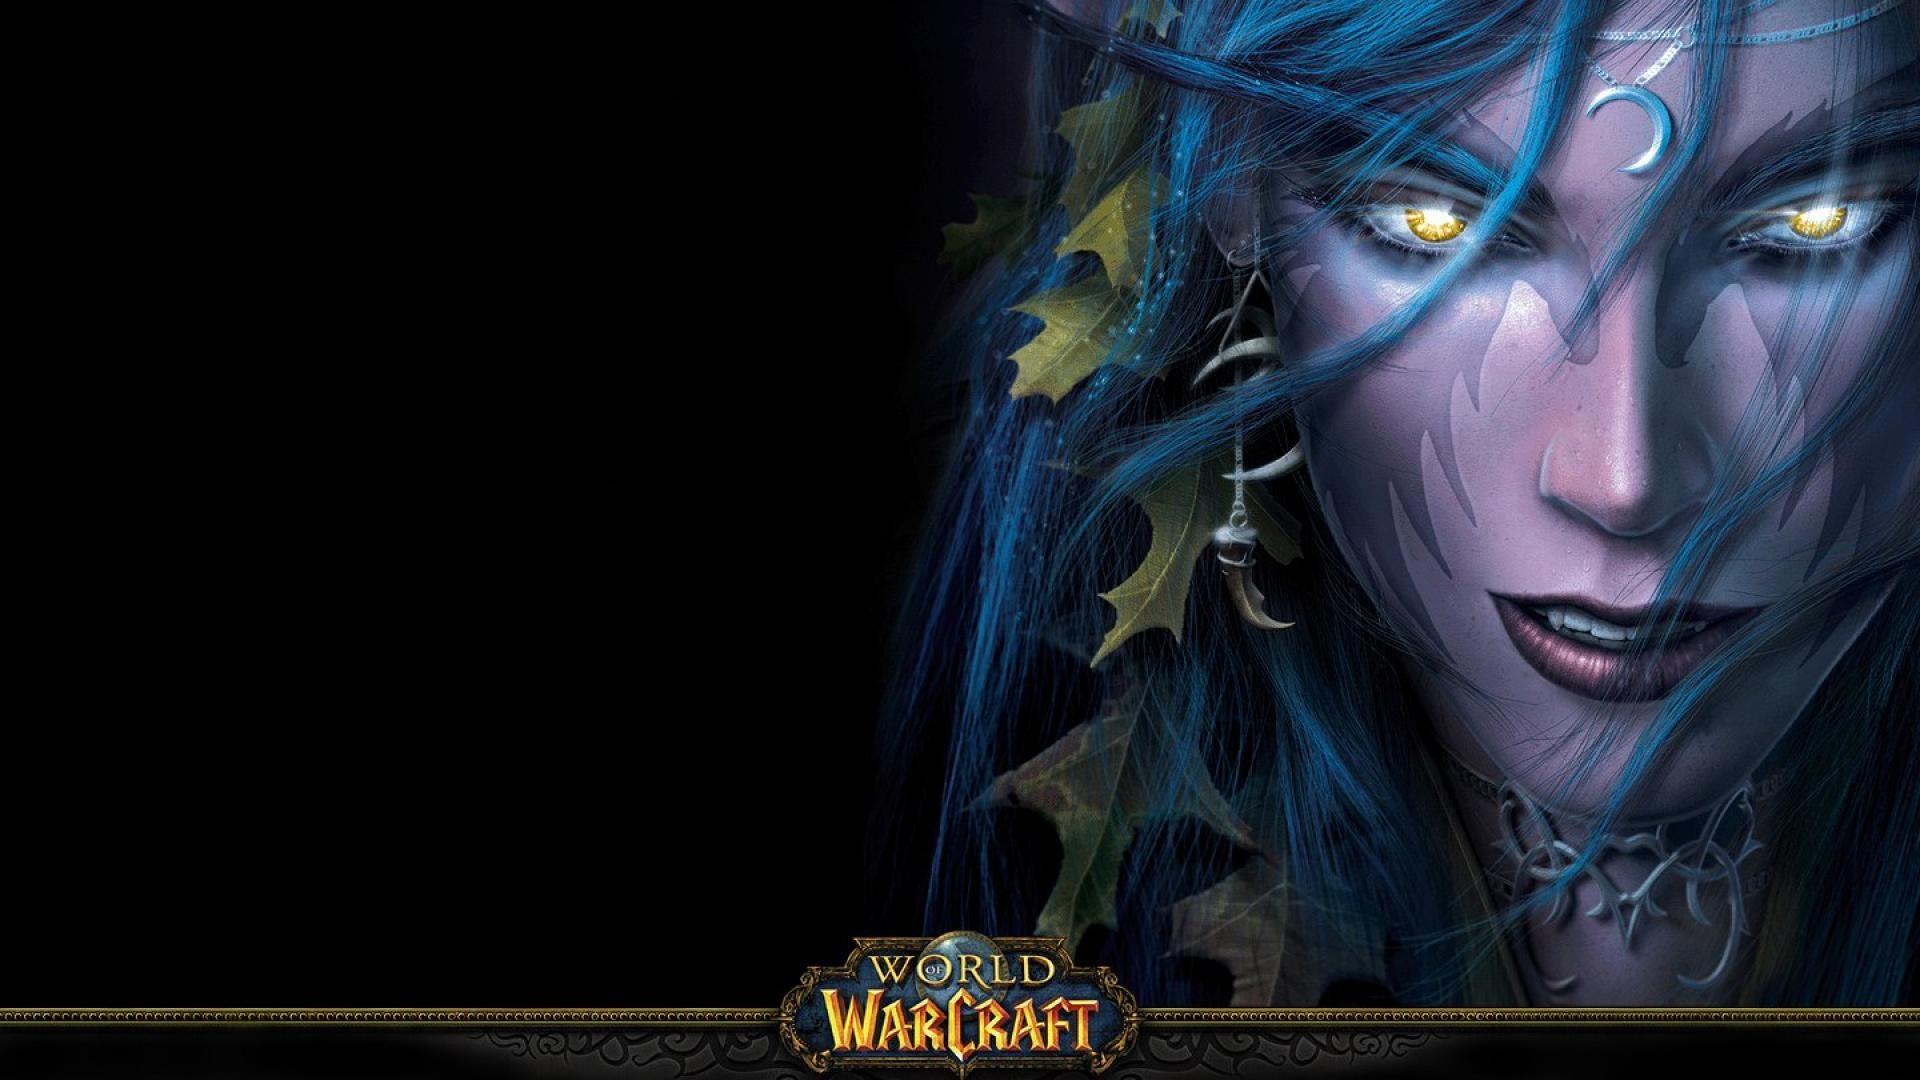 World Of Warcraft Night Elf Wallpaper Wallarc World Of Warcraft Wallpaper World Of Warcraft Night Elf